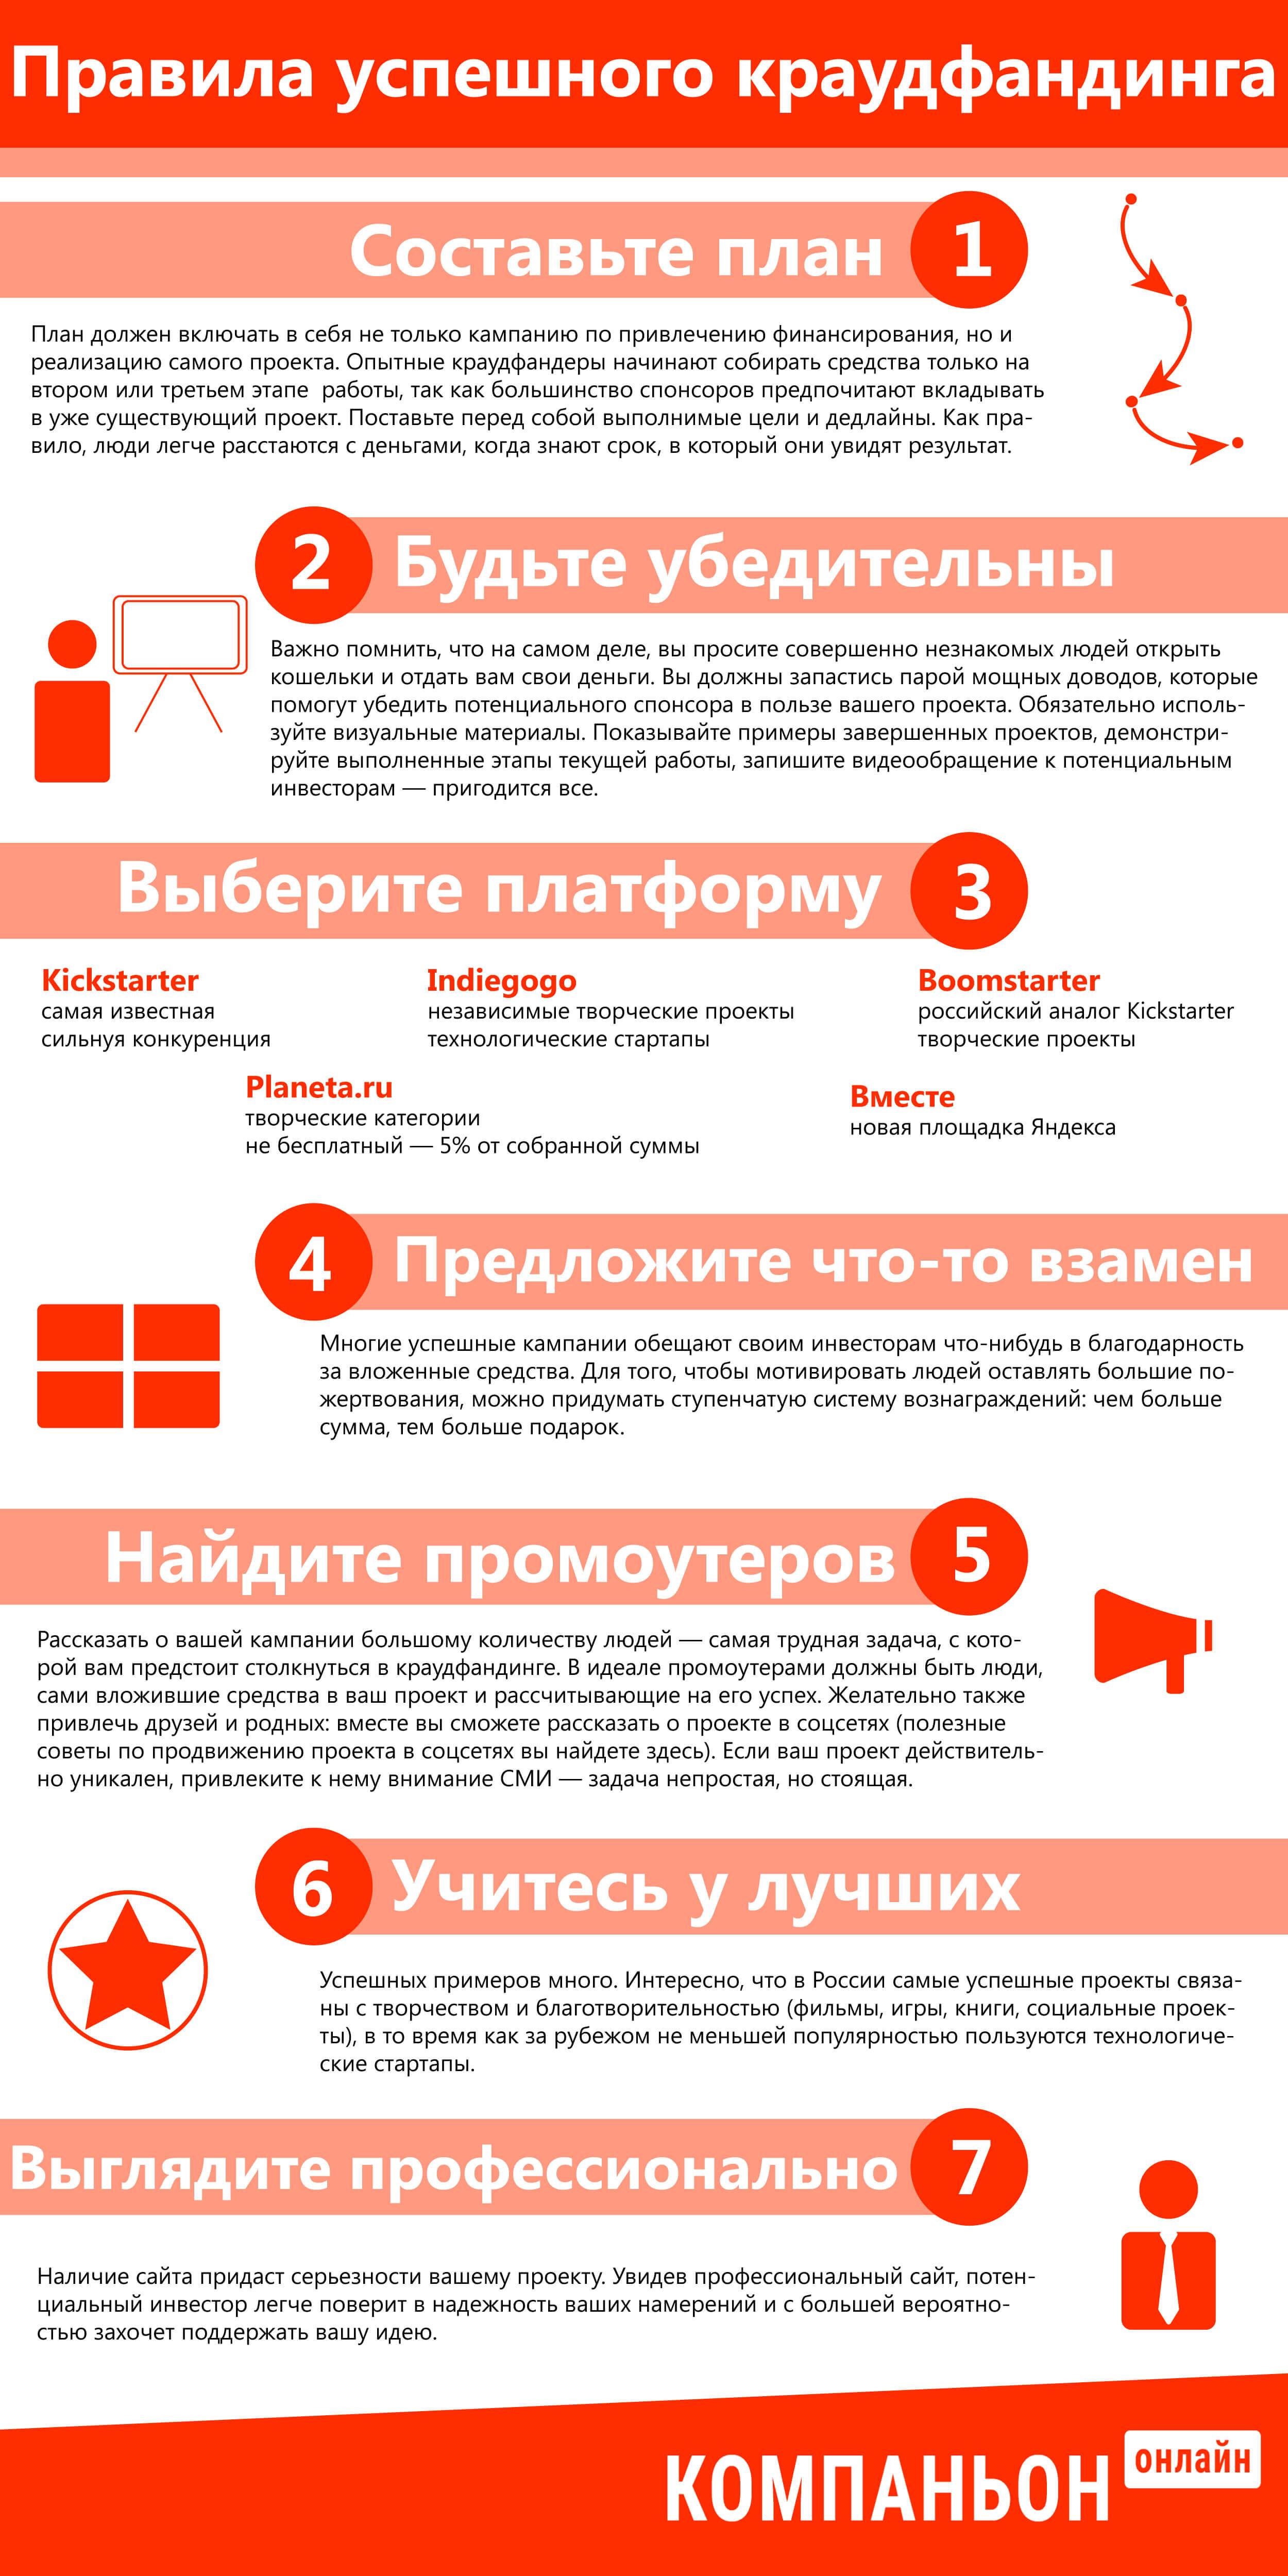 правила успешного краудфандинга